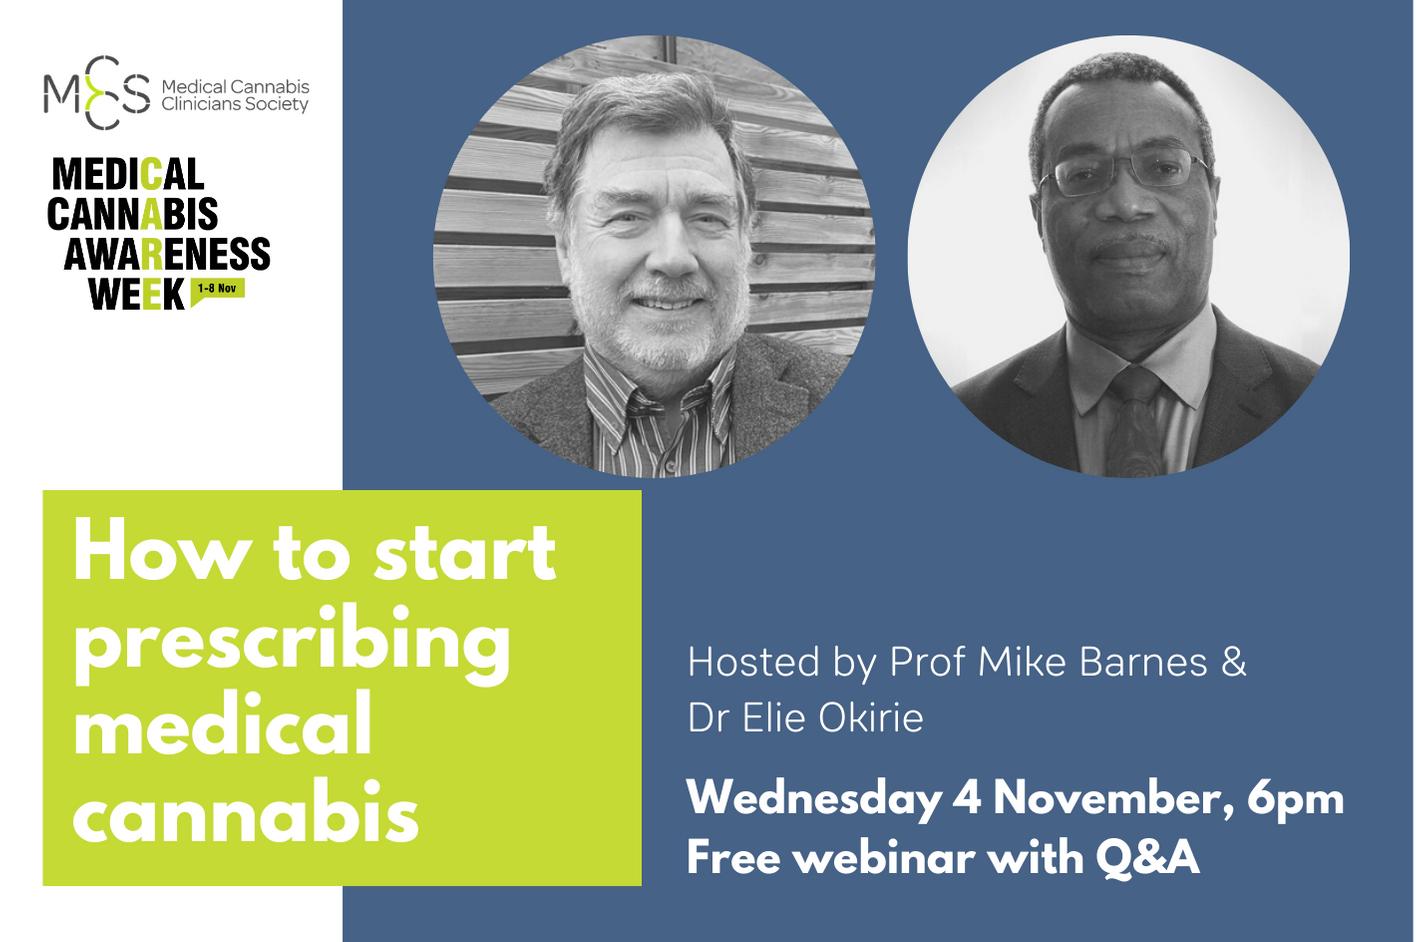 Webinar: How to Start Prescribing Medical Cannabis